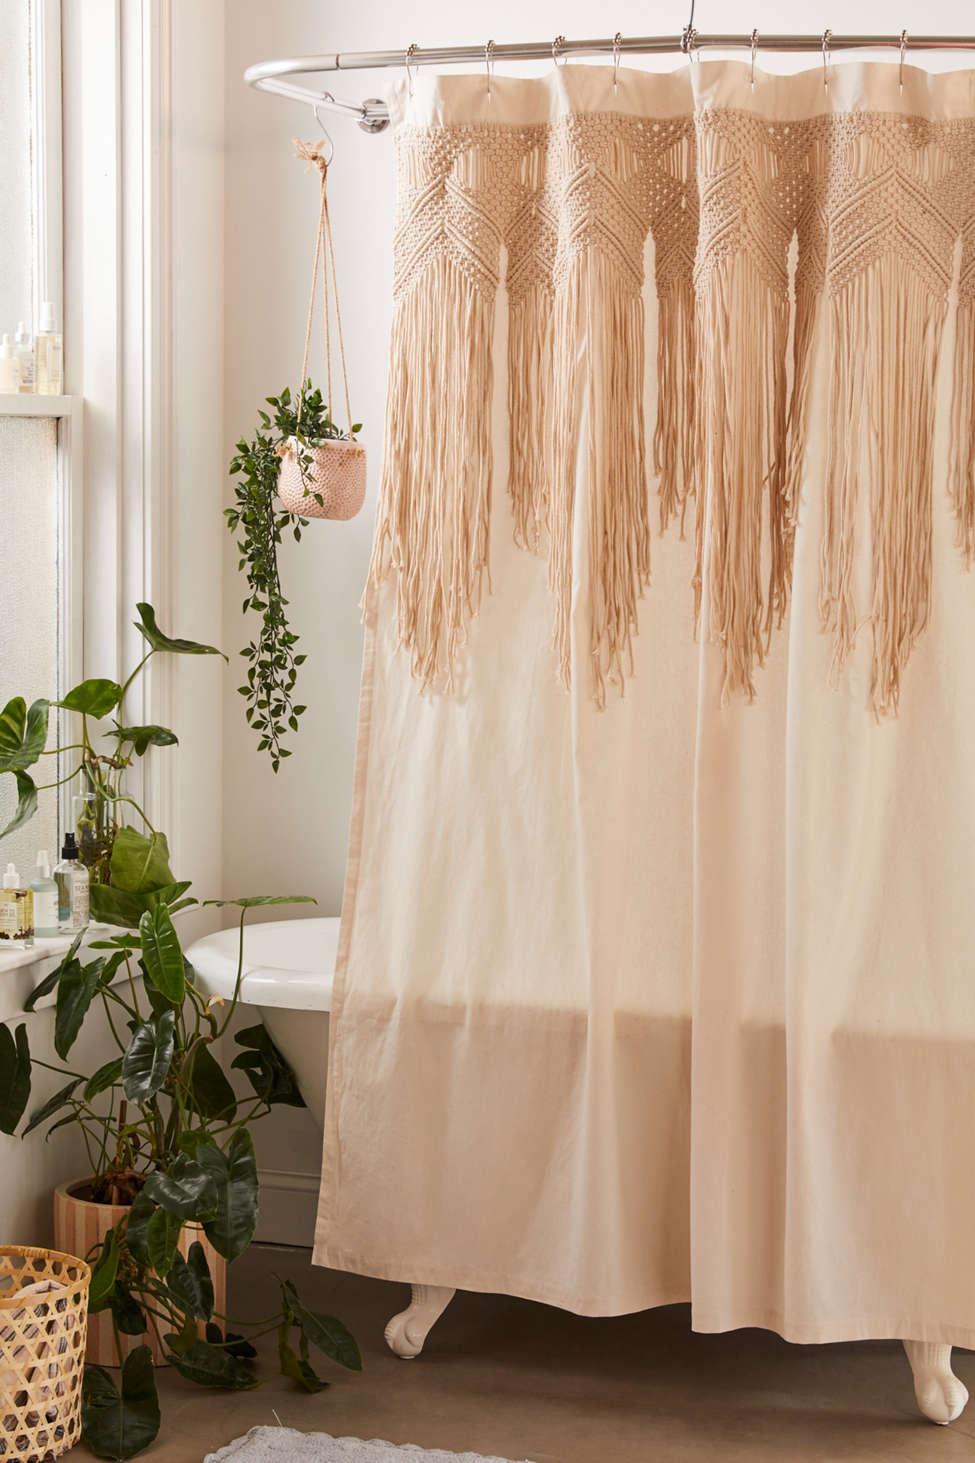 Slide View: 1: Macramé Shower Curtain